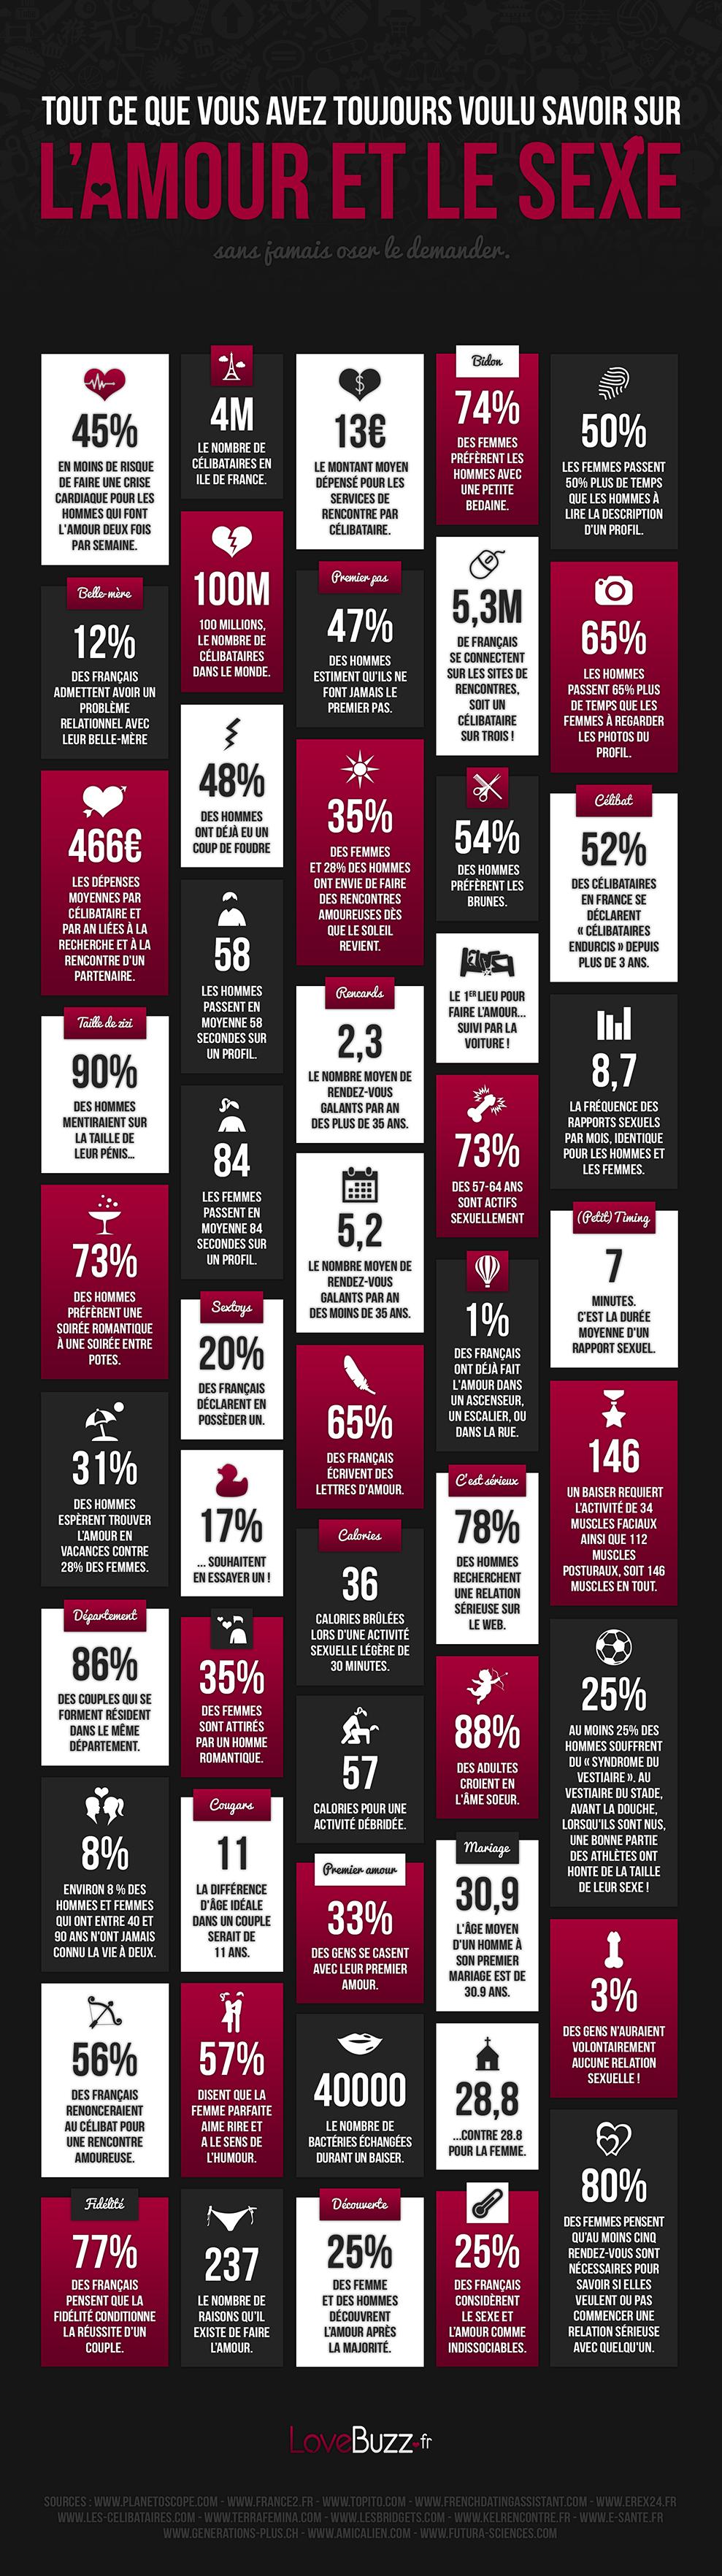 byedel_infographic_lovebuzz